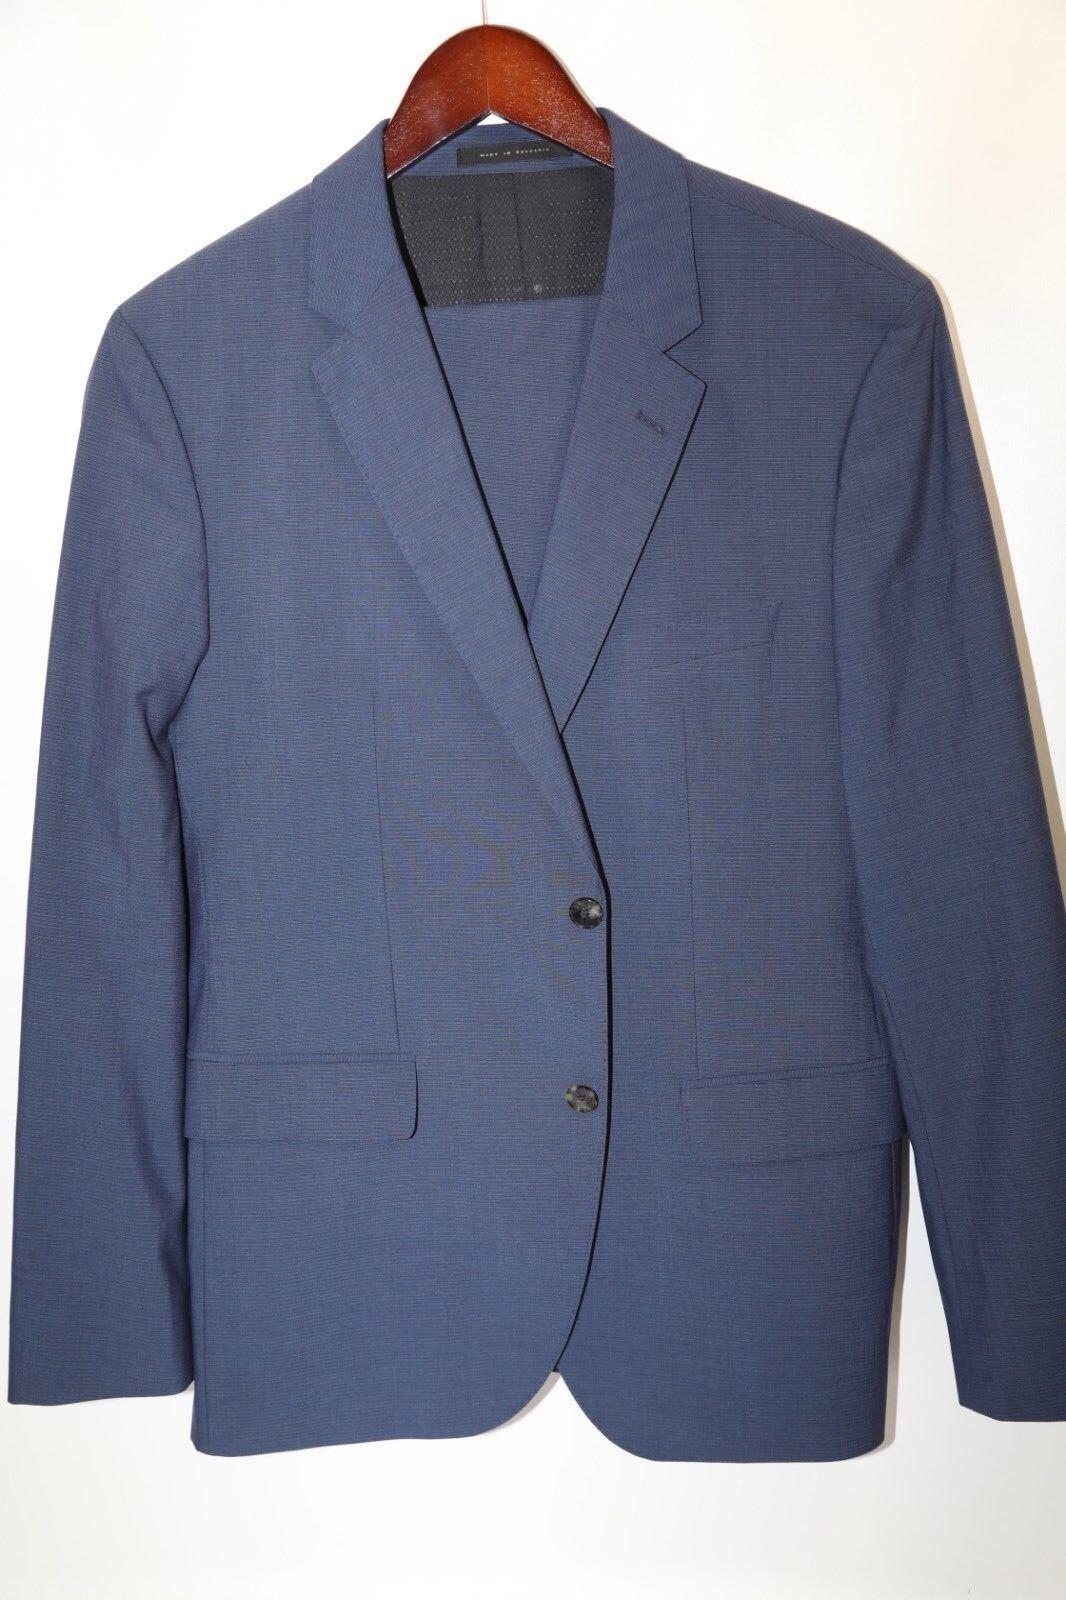 149 HUGO BOSS Johnstons1/Lenon Blau Suit Größe 40 R